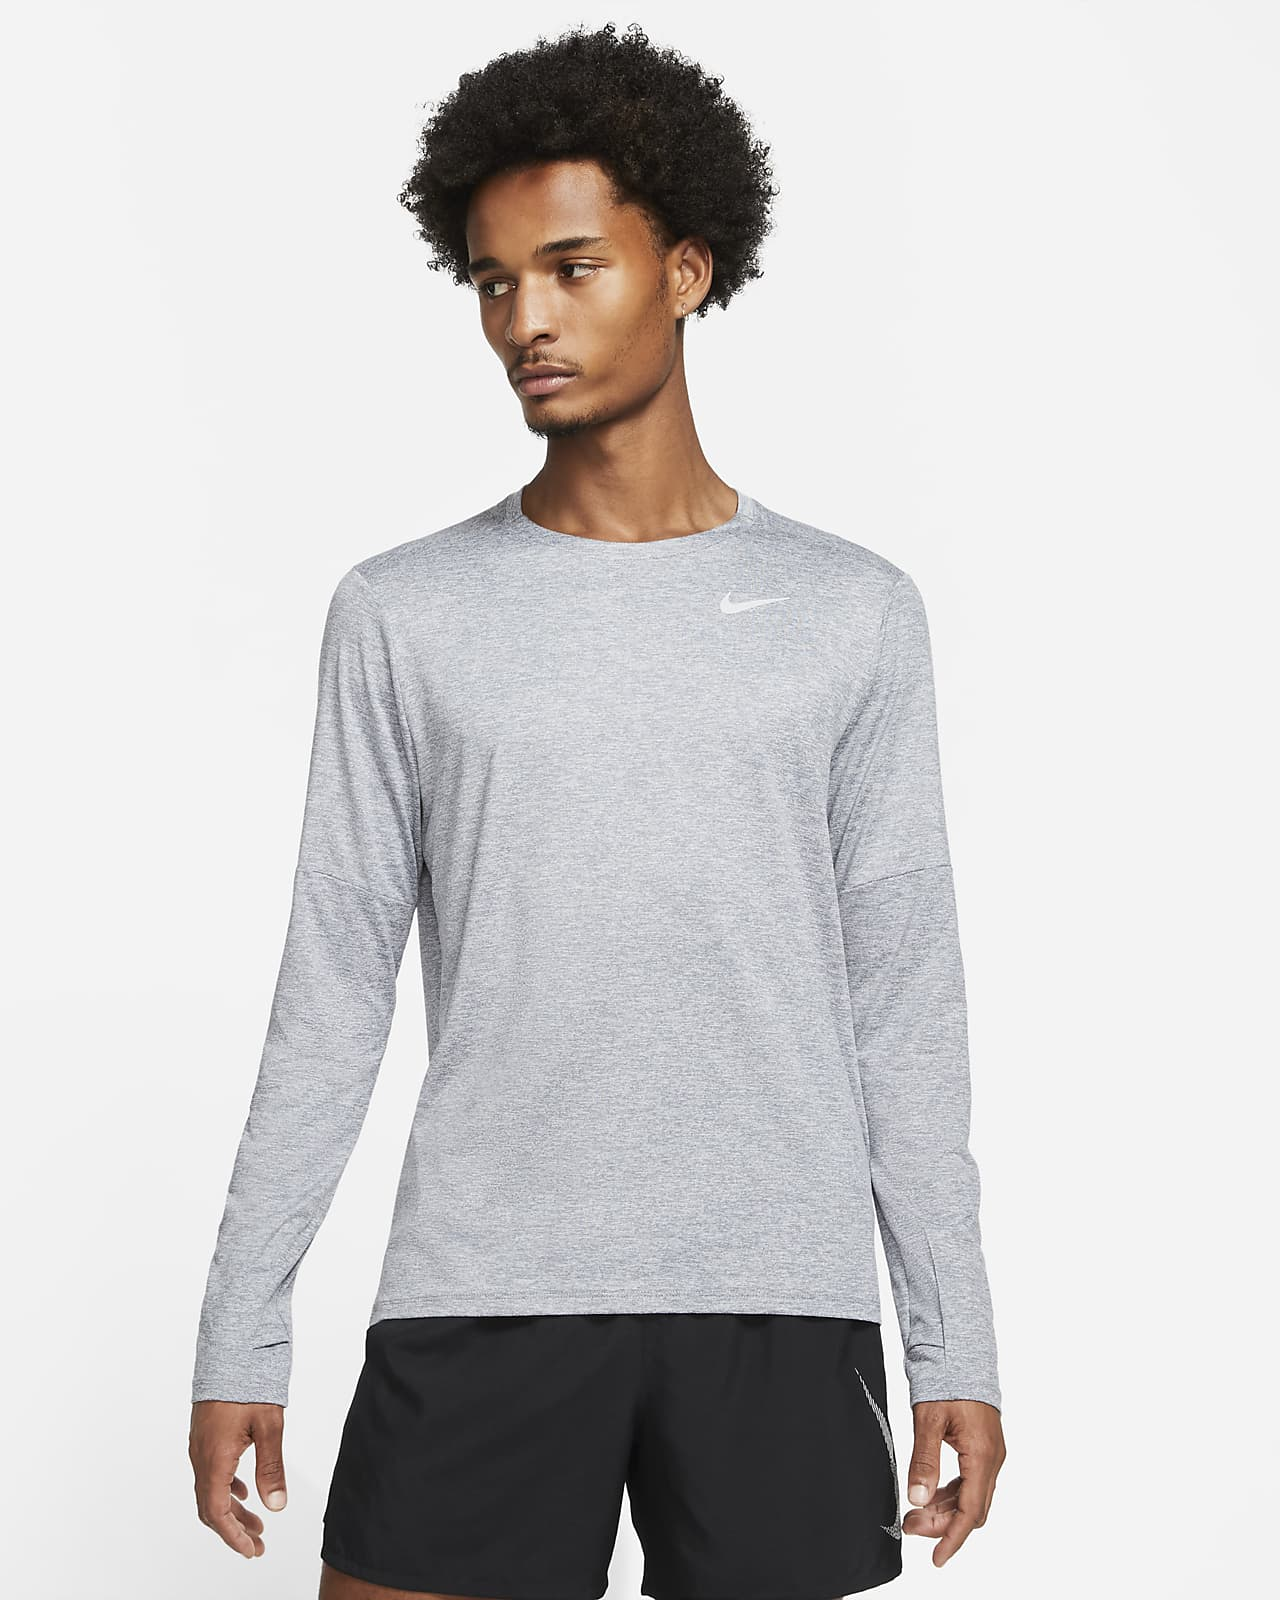 Camiseta de cuello redondo de running para hombre Nike Dri-FIT Element